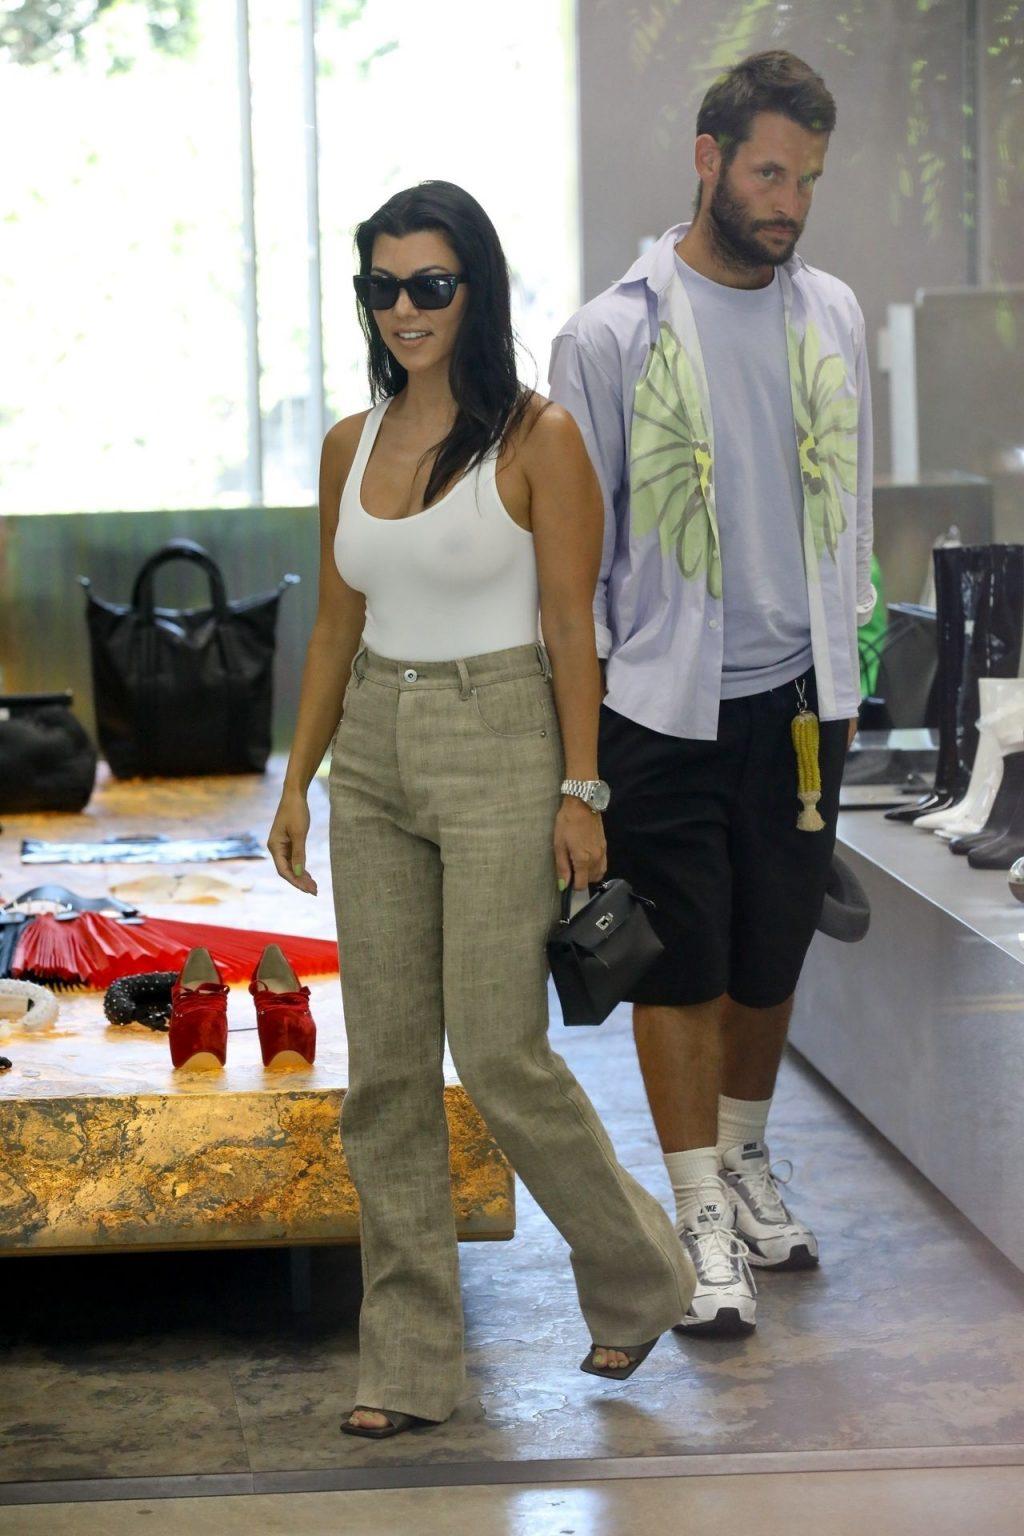 Kourtney Kardashian See Through Thefappeningblog Com 111 102